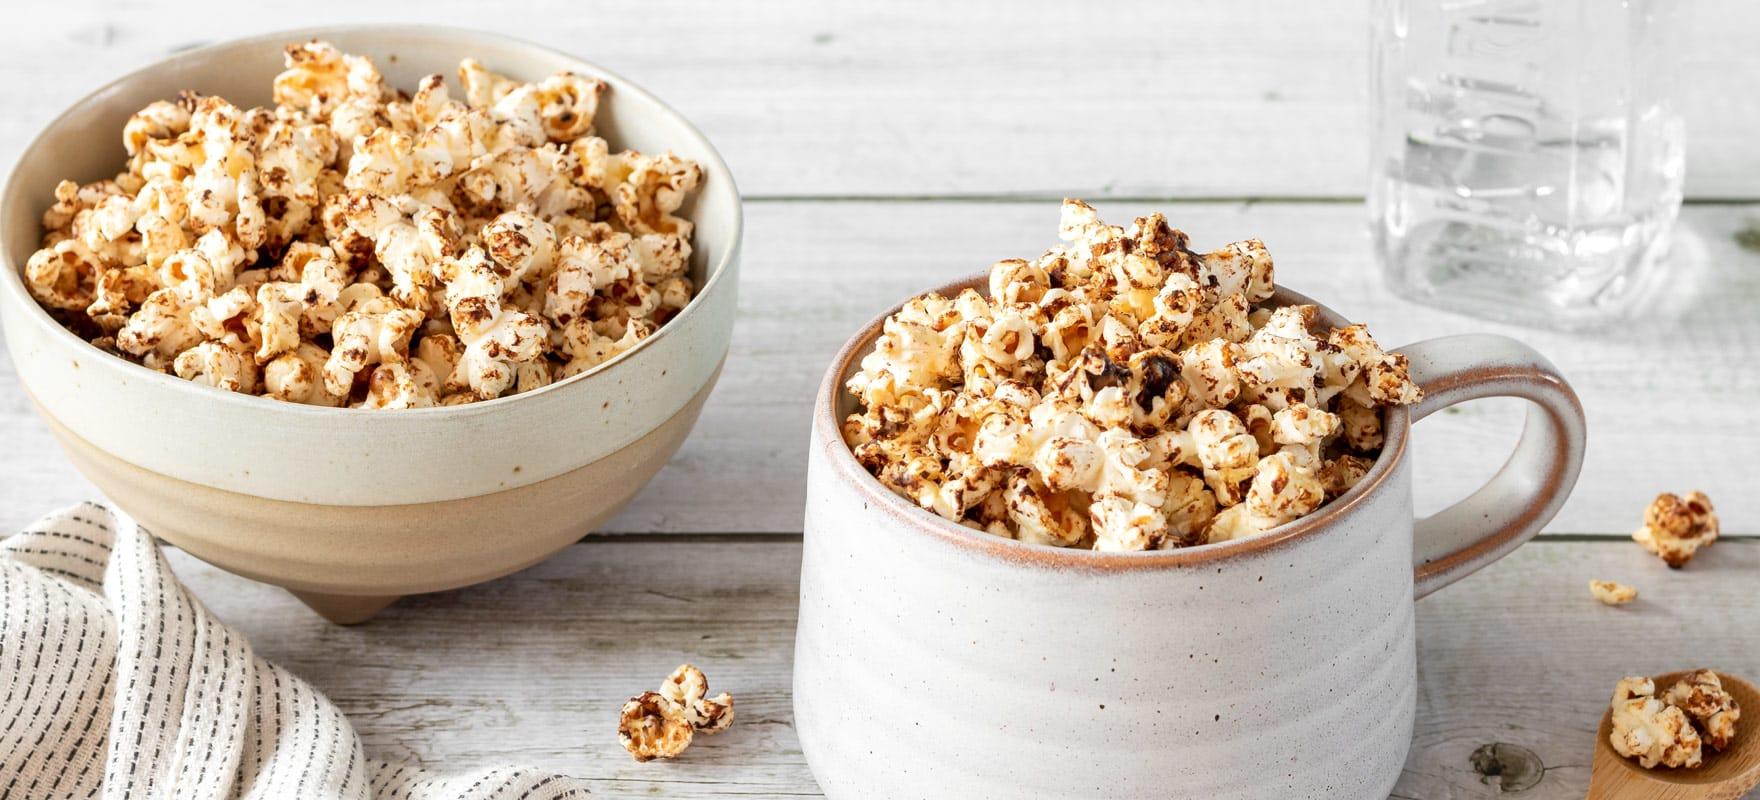 Marmite popcorn image 1